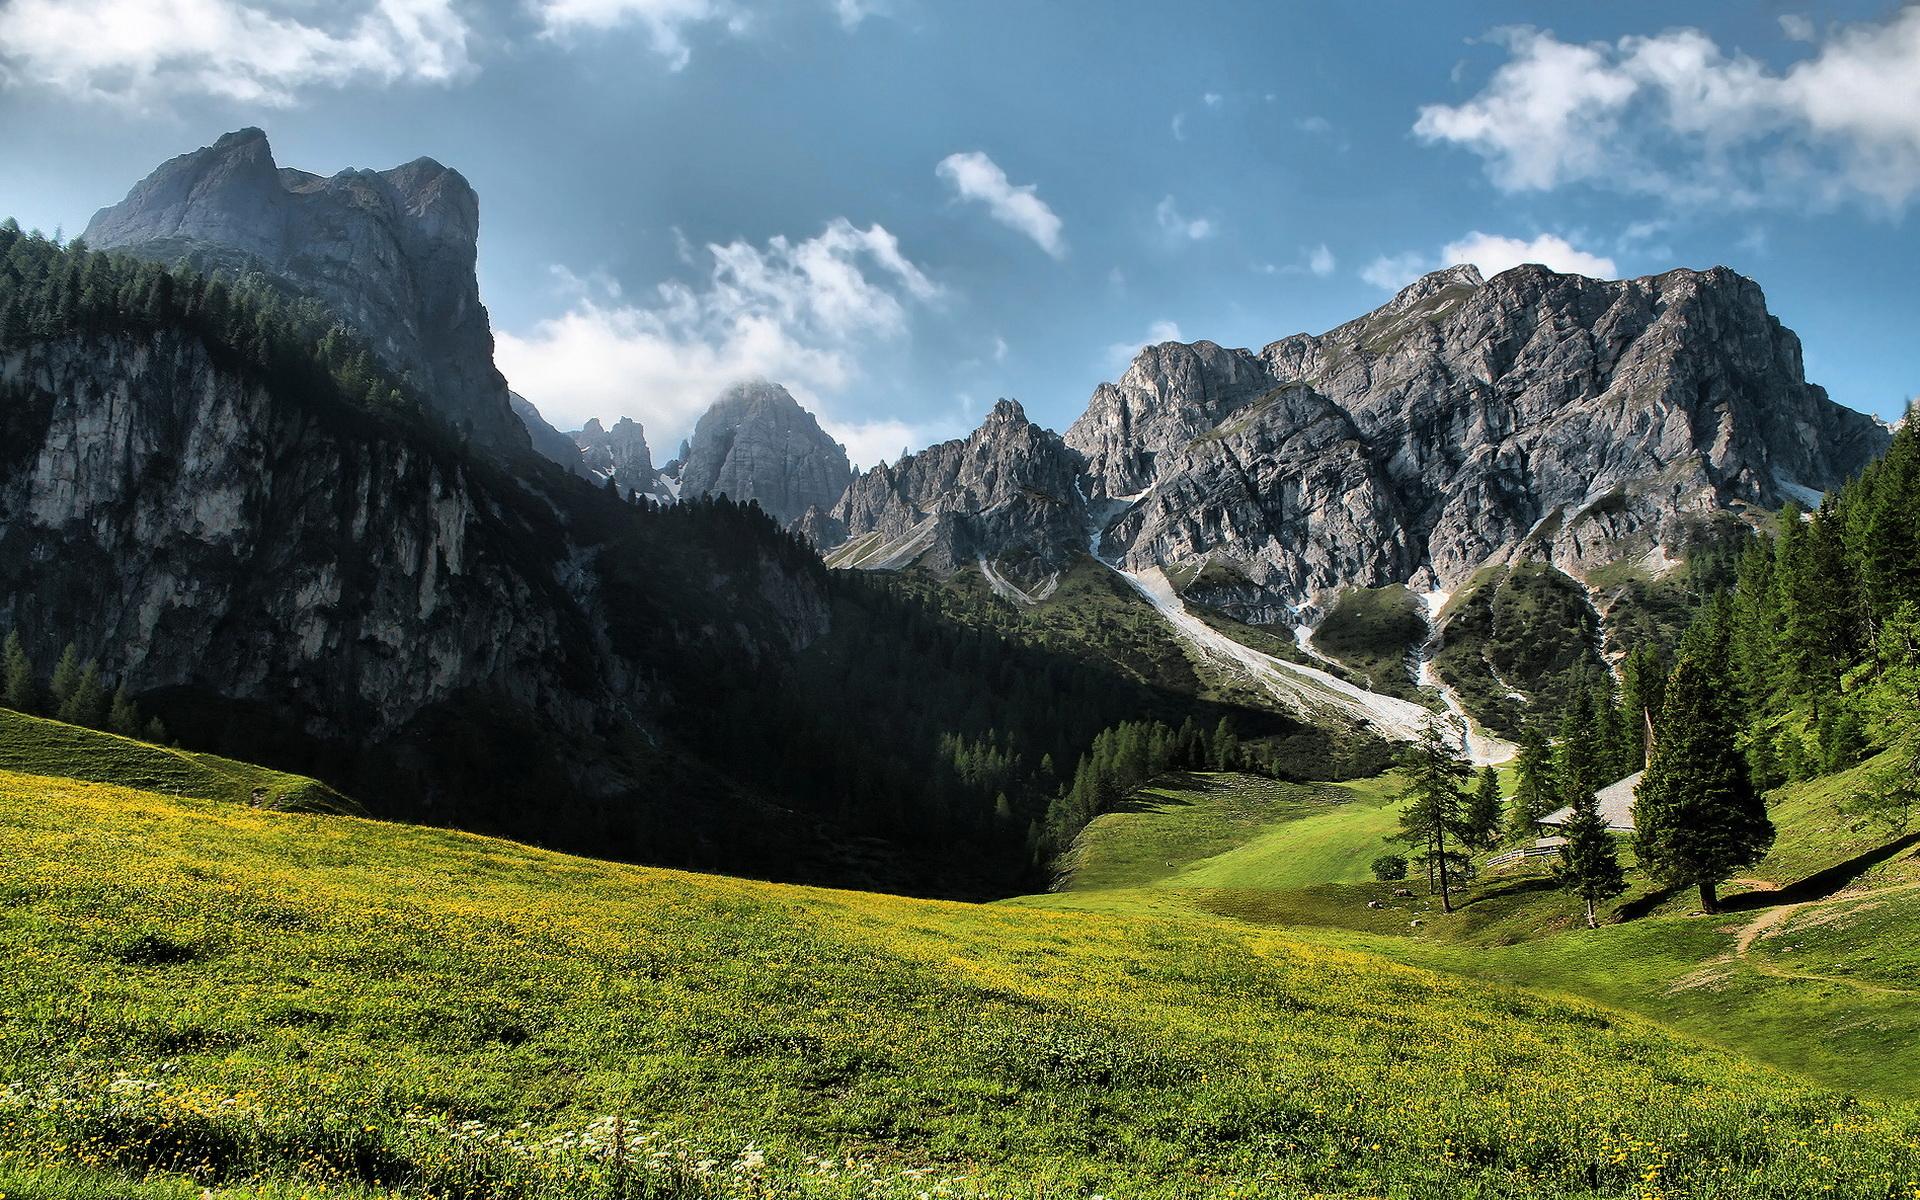 Rocky Mountains Wallpaper Hd Desktop Wallpaper